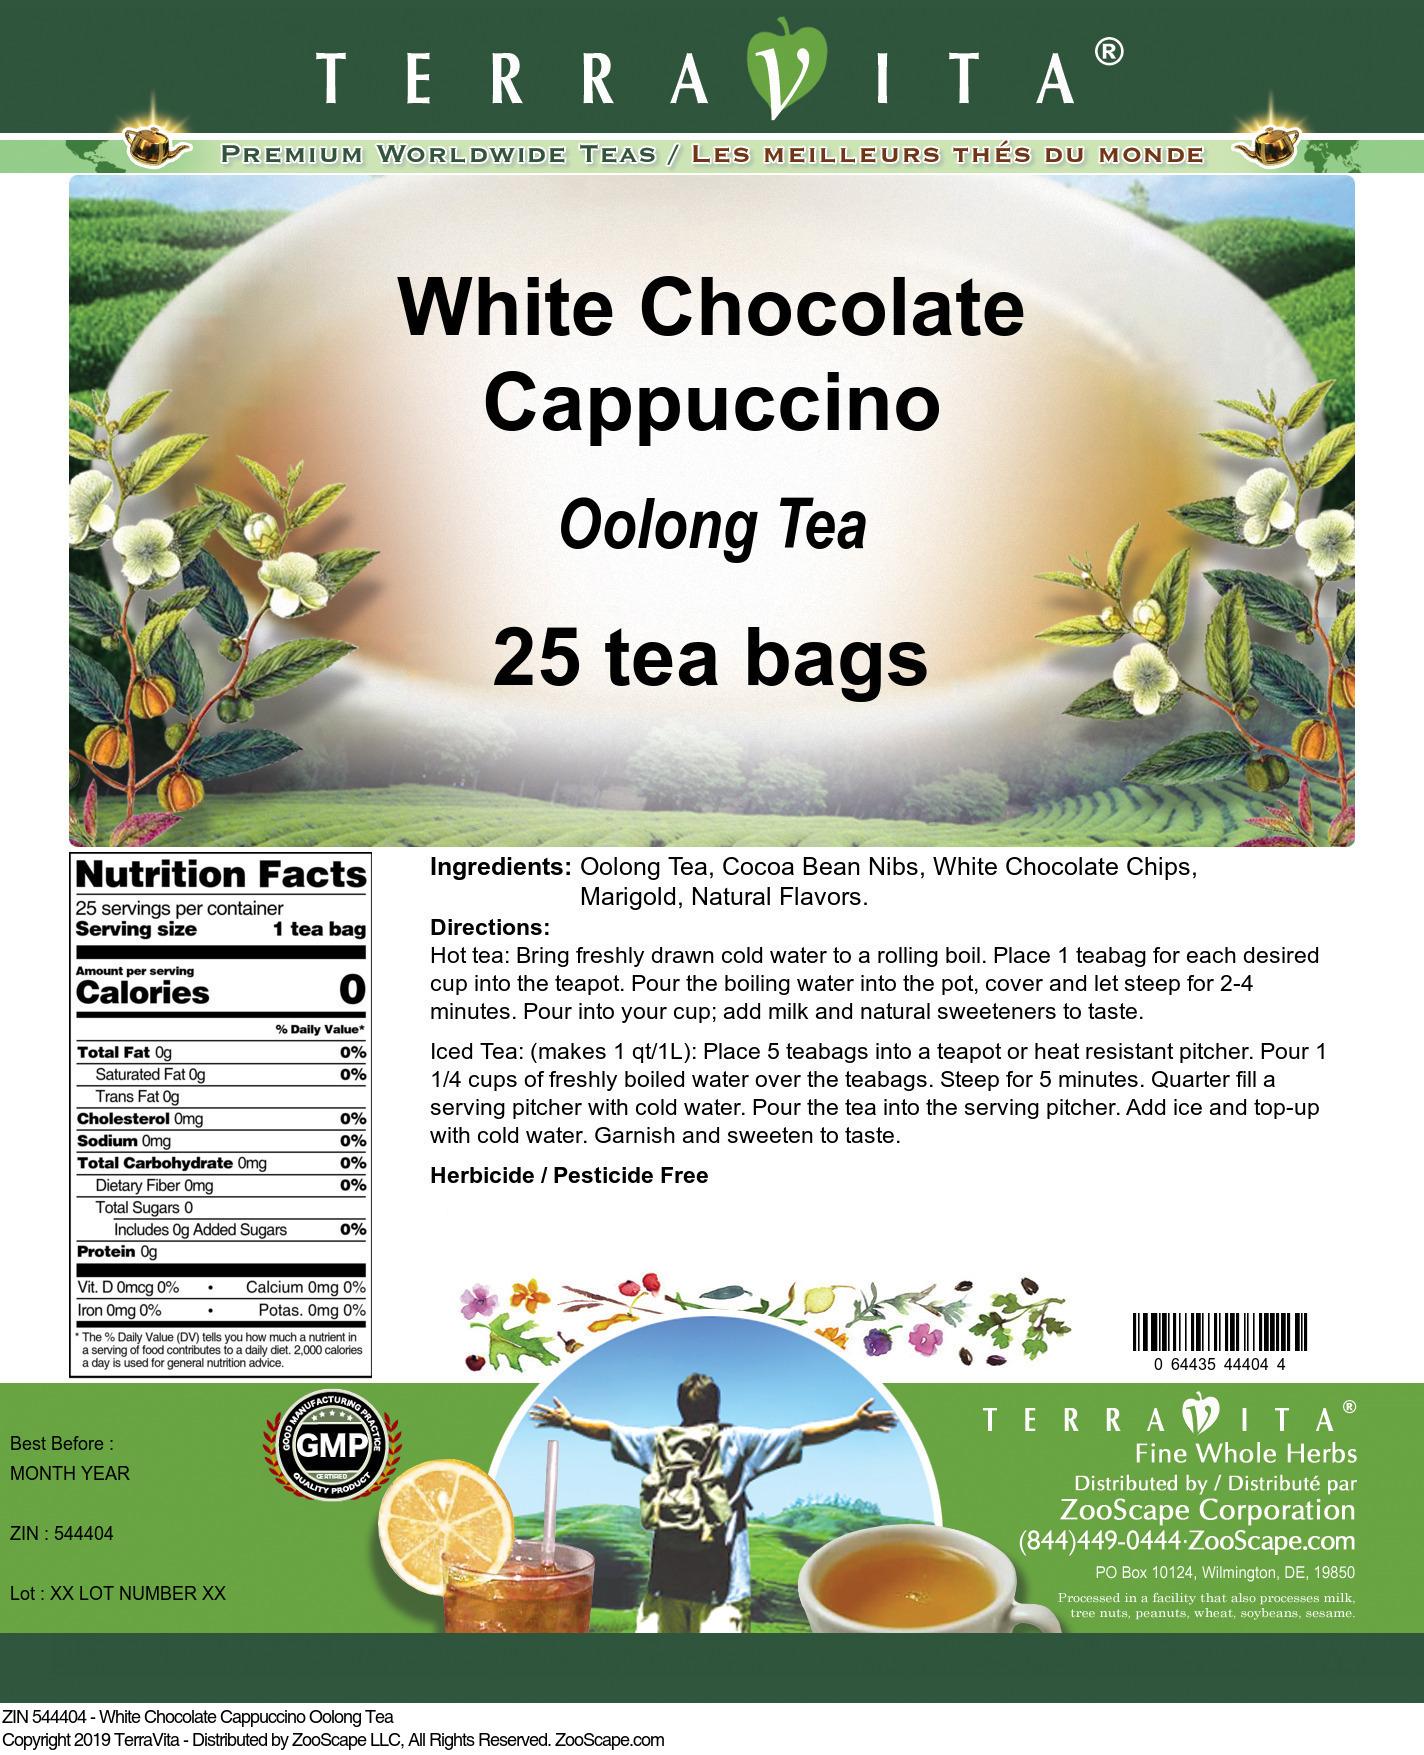 White Chocolate Cappuccino Oolong Tea